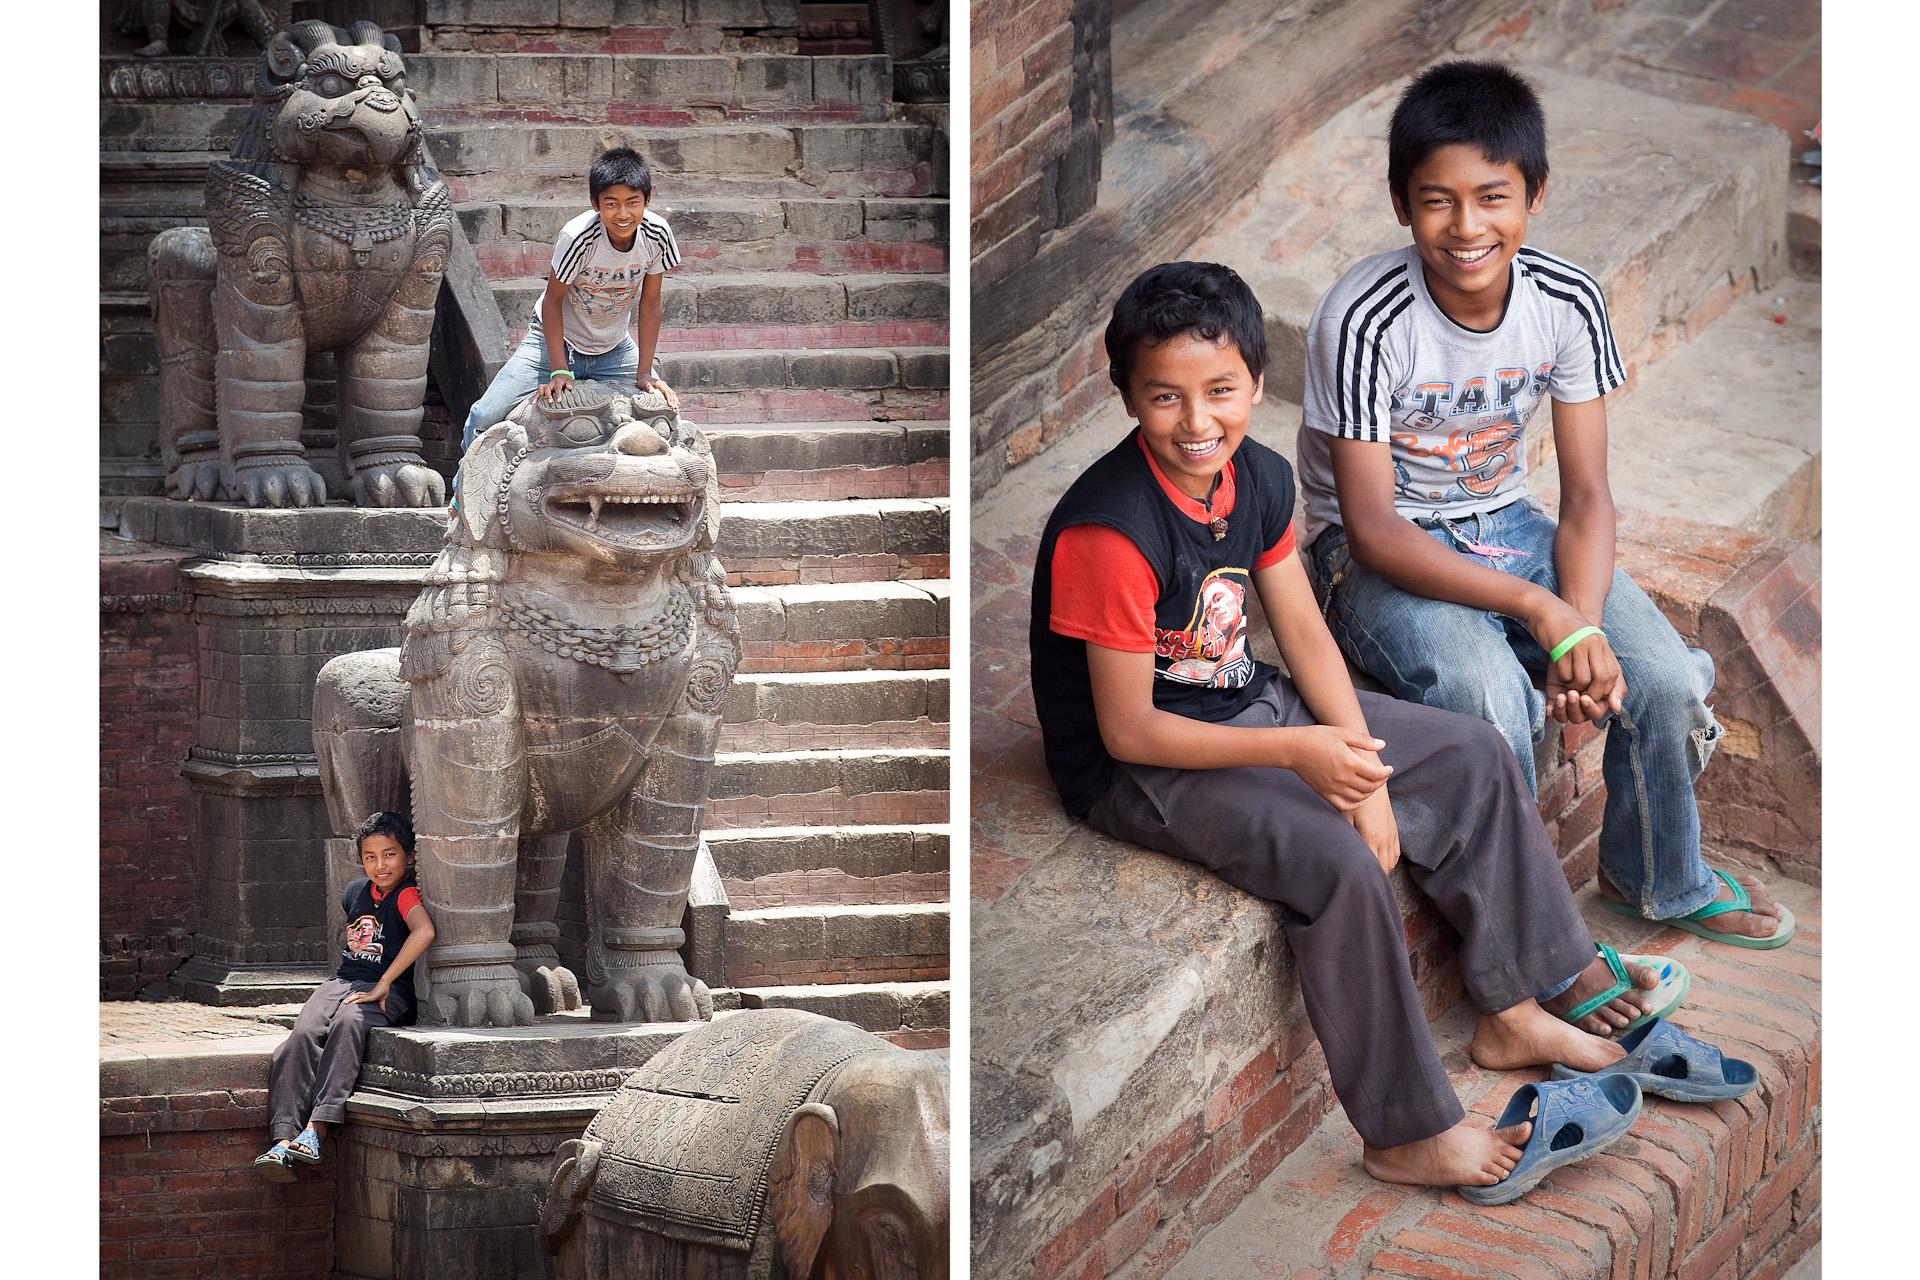 Nepal-Bhaktapur-Travel-Children-Portrait-1.JPG